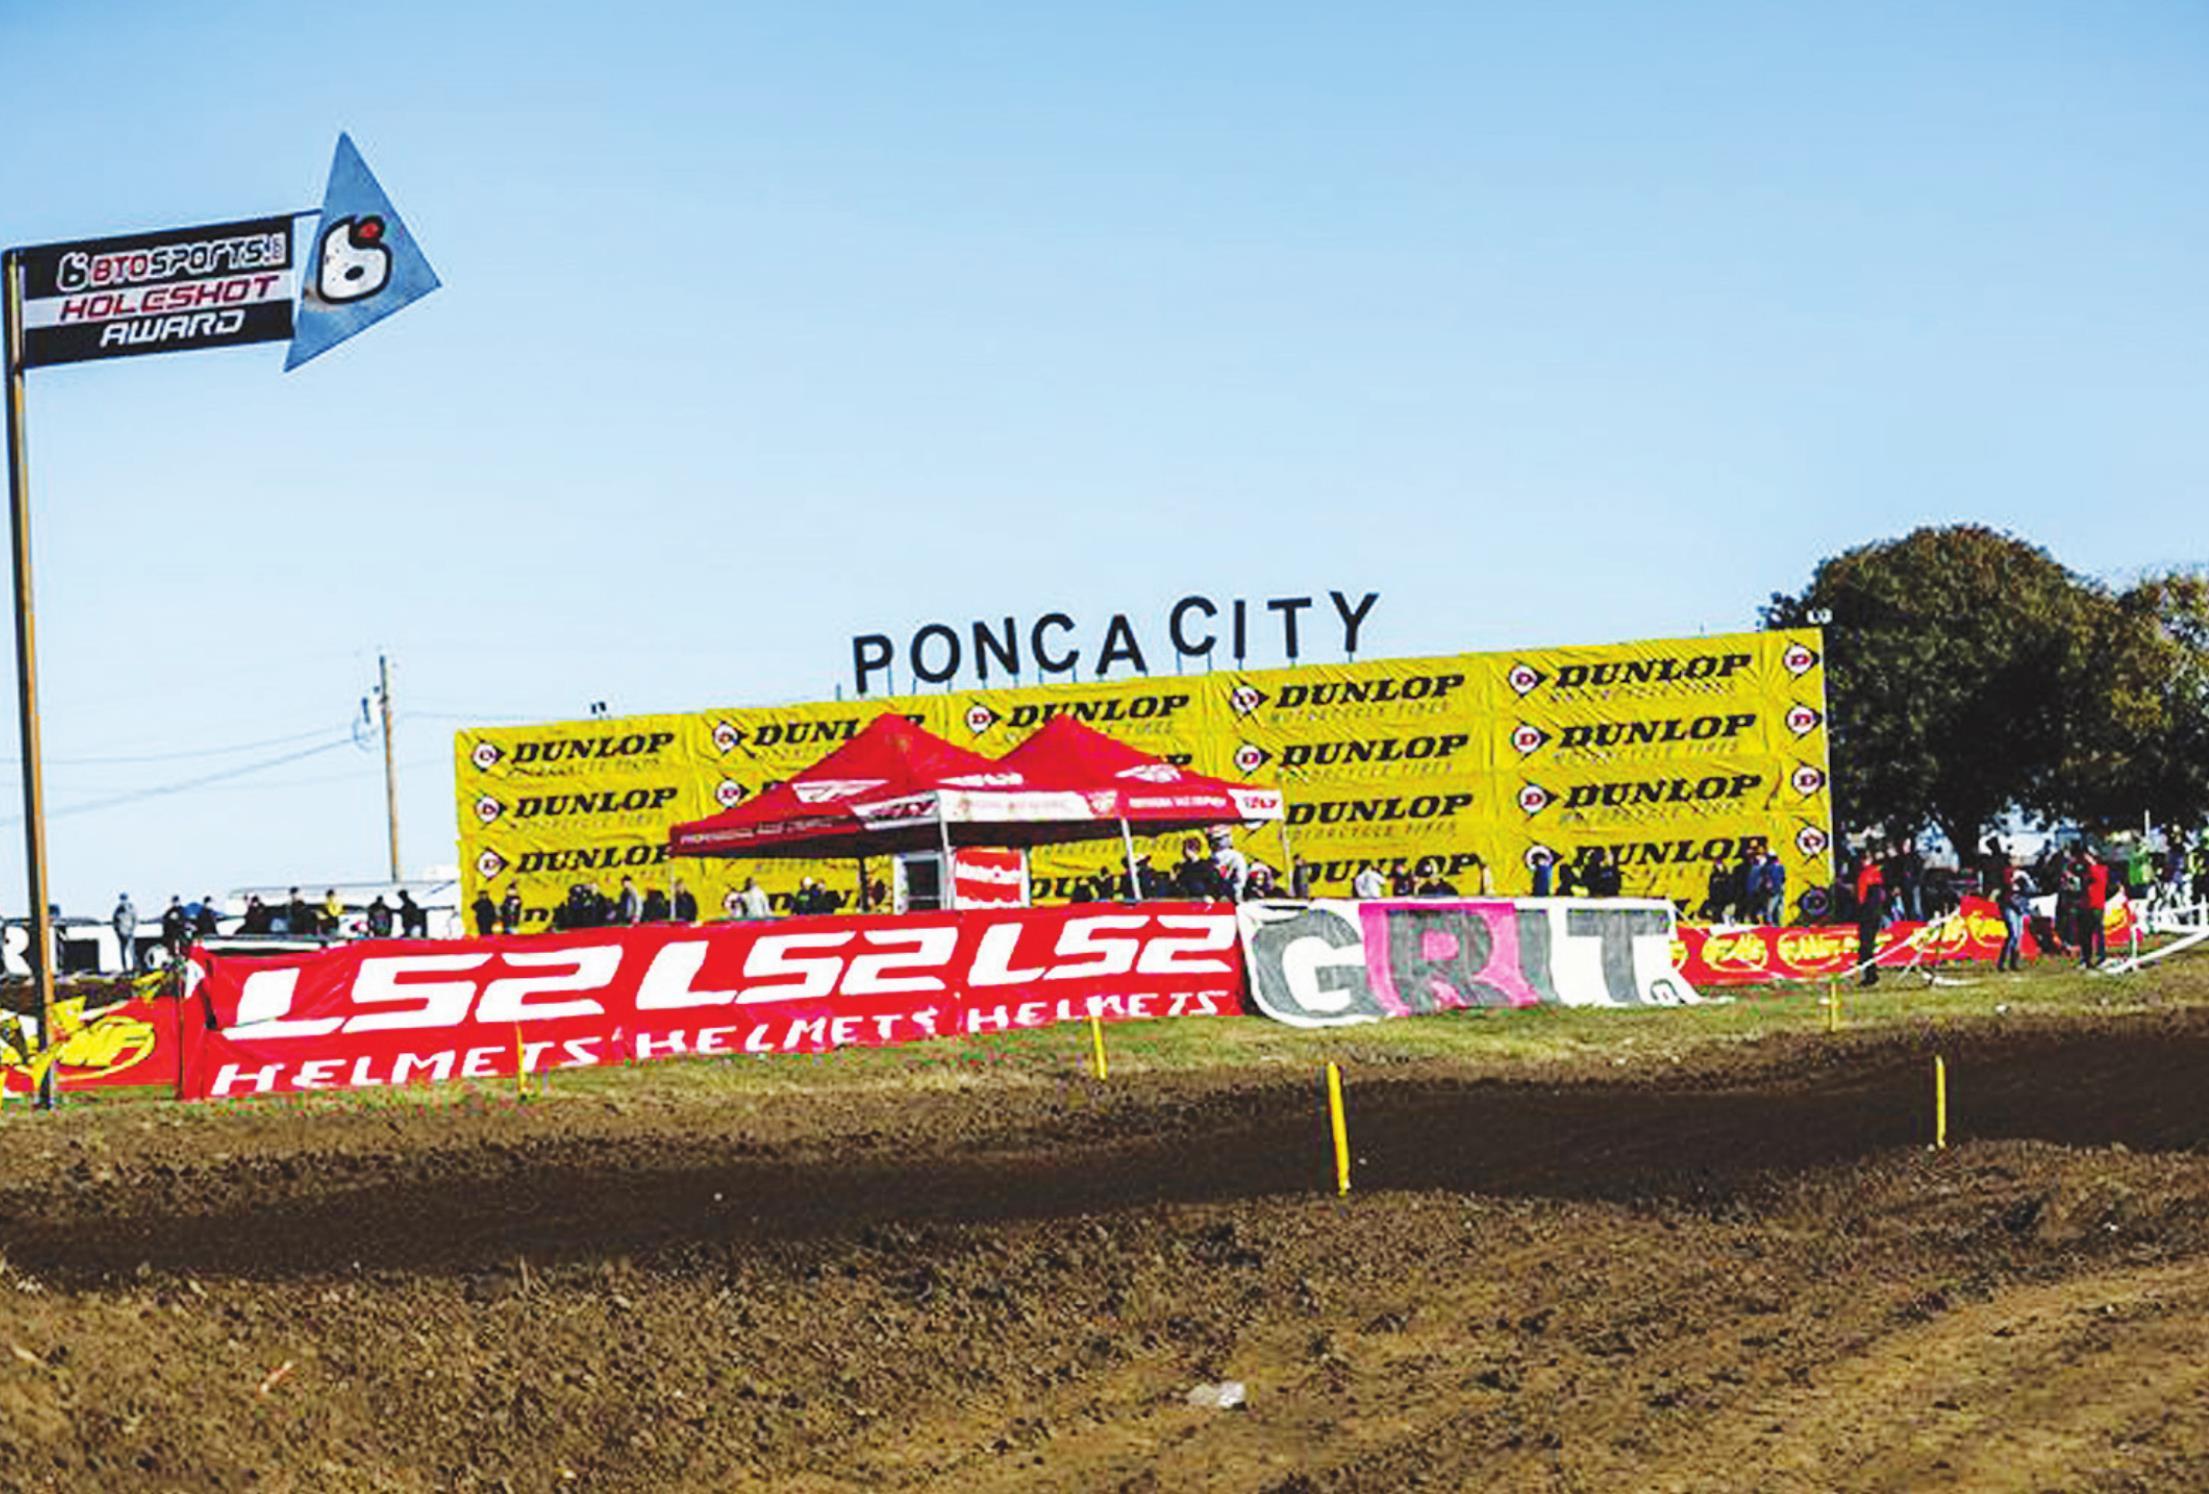 City Will Host Motocross Event Ponca City News